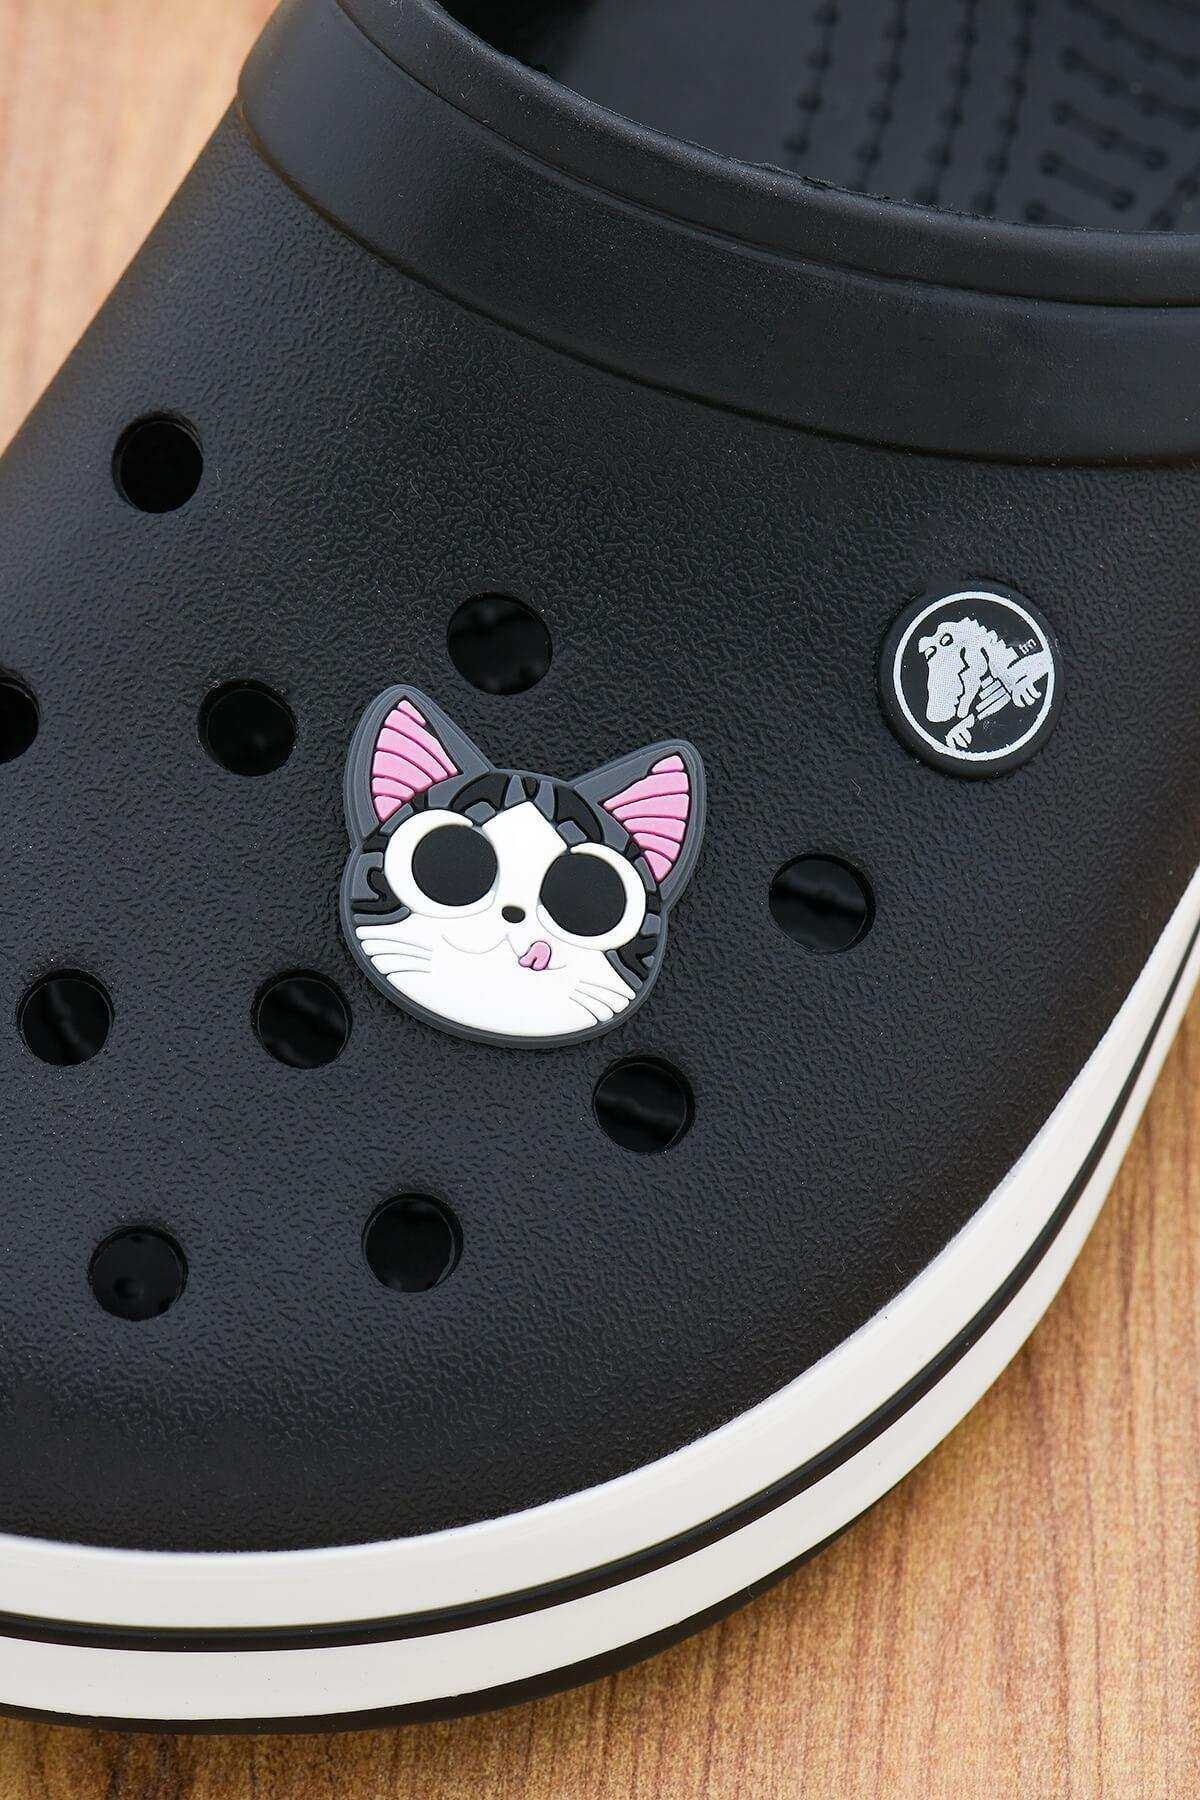 Kedi Jibbitz Crocs Terlik Süsü Charm Terlik Aksesuarı - CRS0015